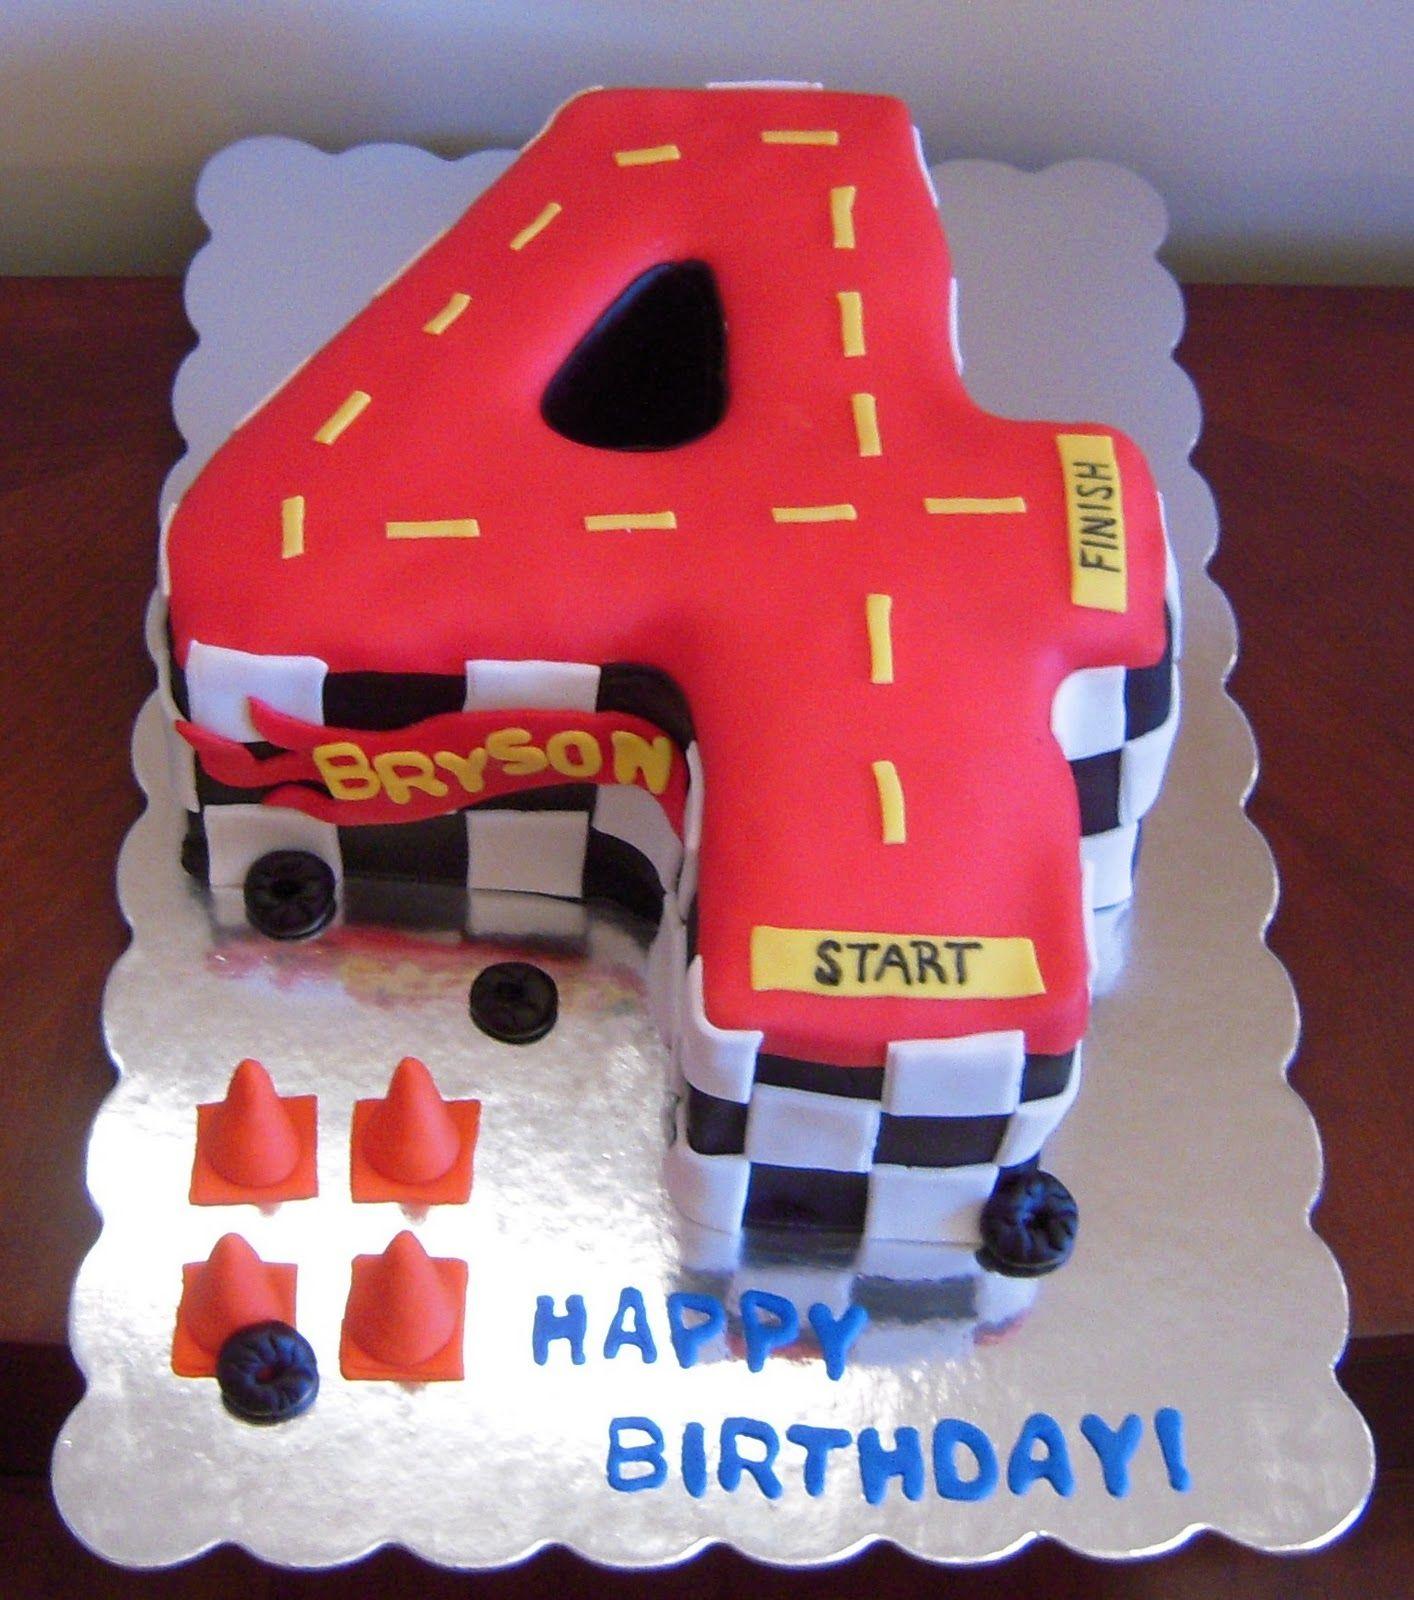 Icing Makes The Cake Hot Wheels Birthday Cake Hot Wheels Birthday Hotwheels Birthday Party Hot Wheels Birthday Cake